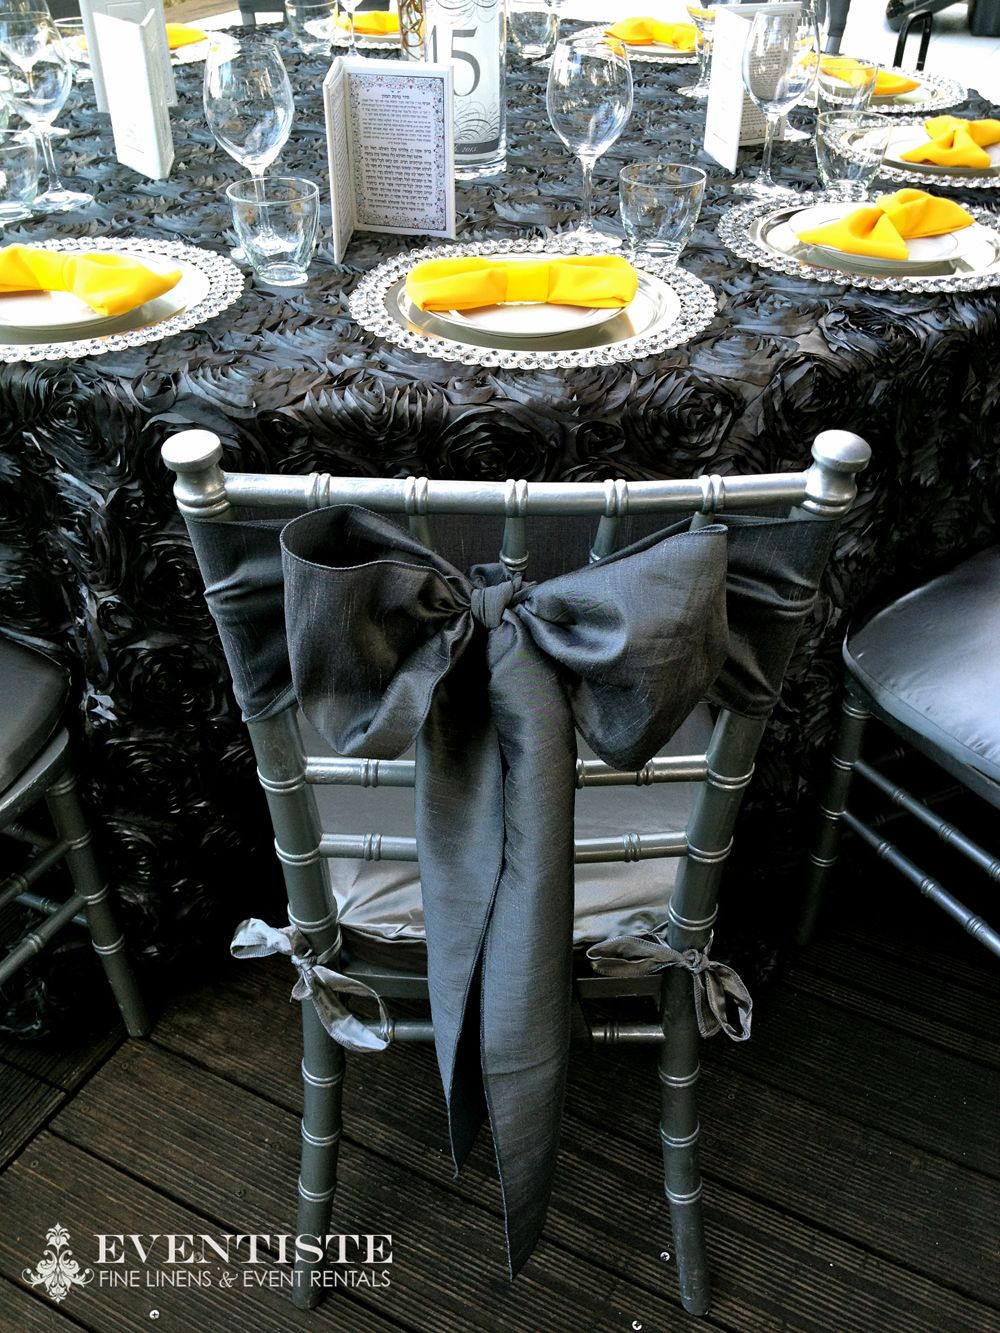 Pewter Splendor Linens, Silver Chiavari Chairs w/ Silver Satin Cushions, Silver Taffeta Sashes, P. Yellow Napkins by Eventiste.